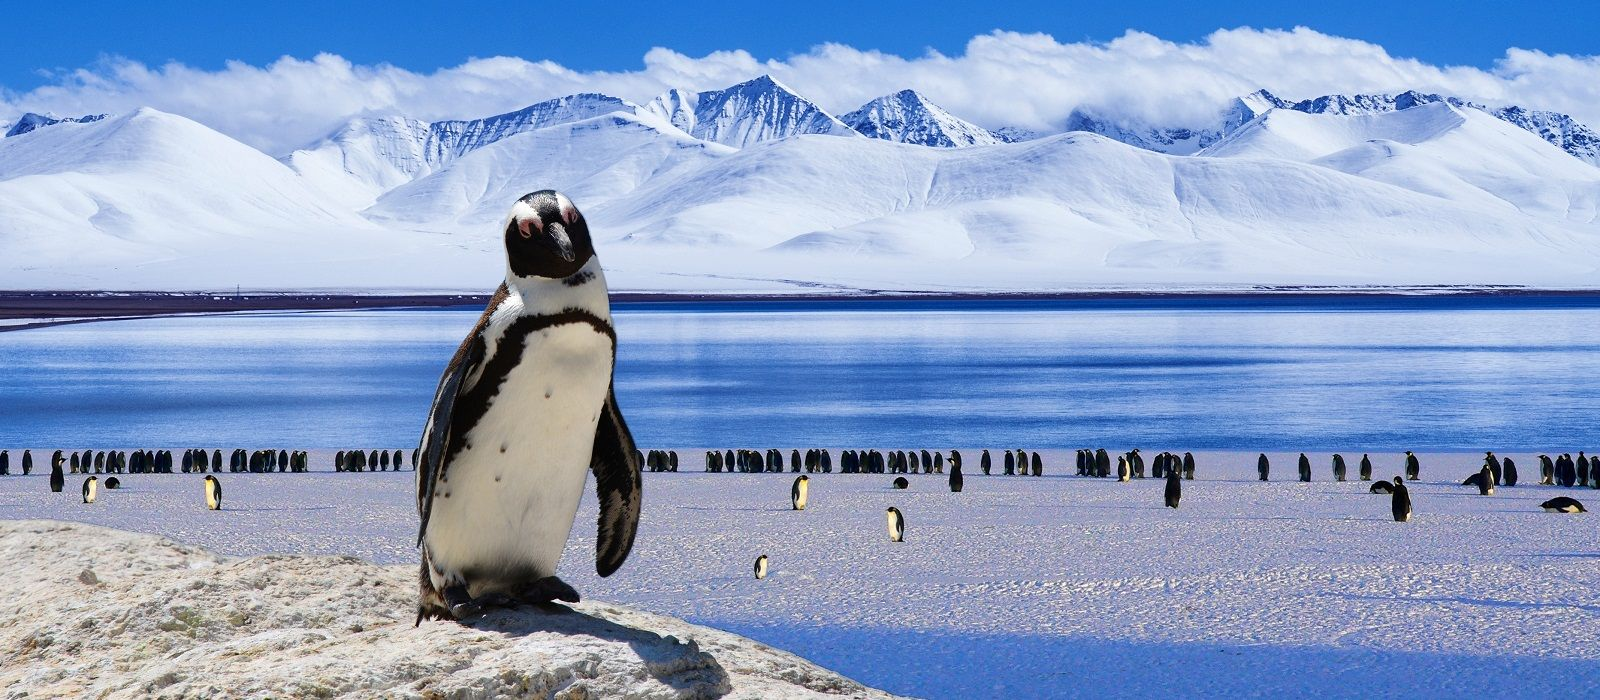 Destination Antarctica Antarctica